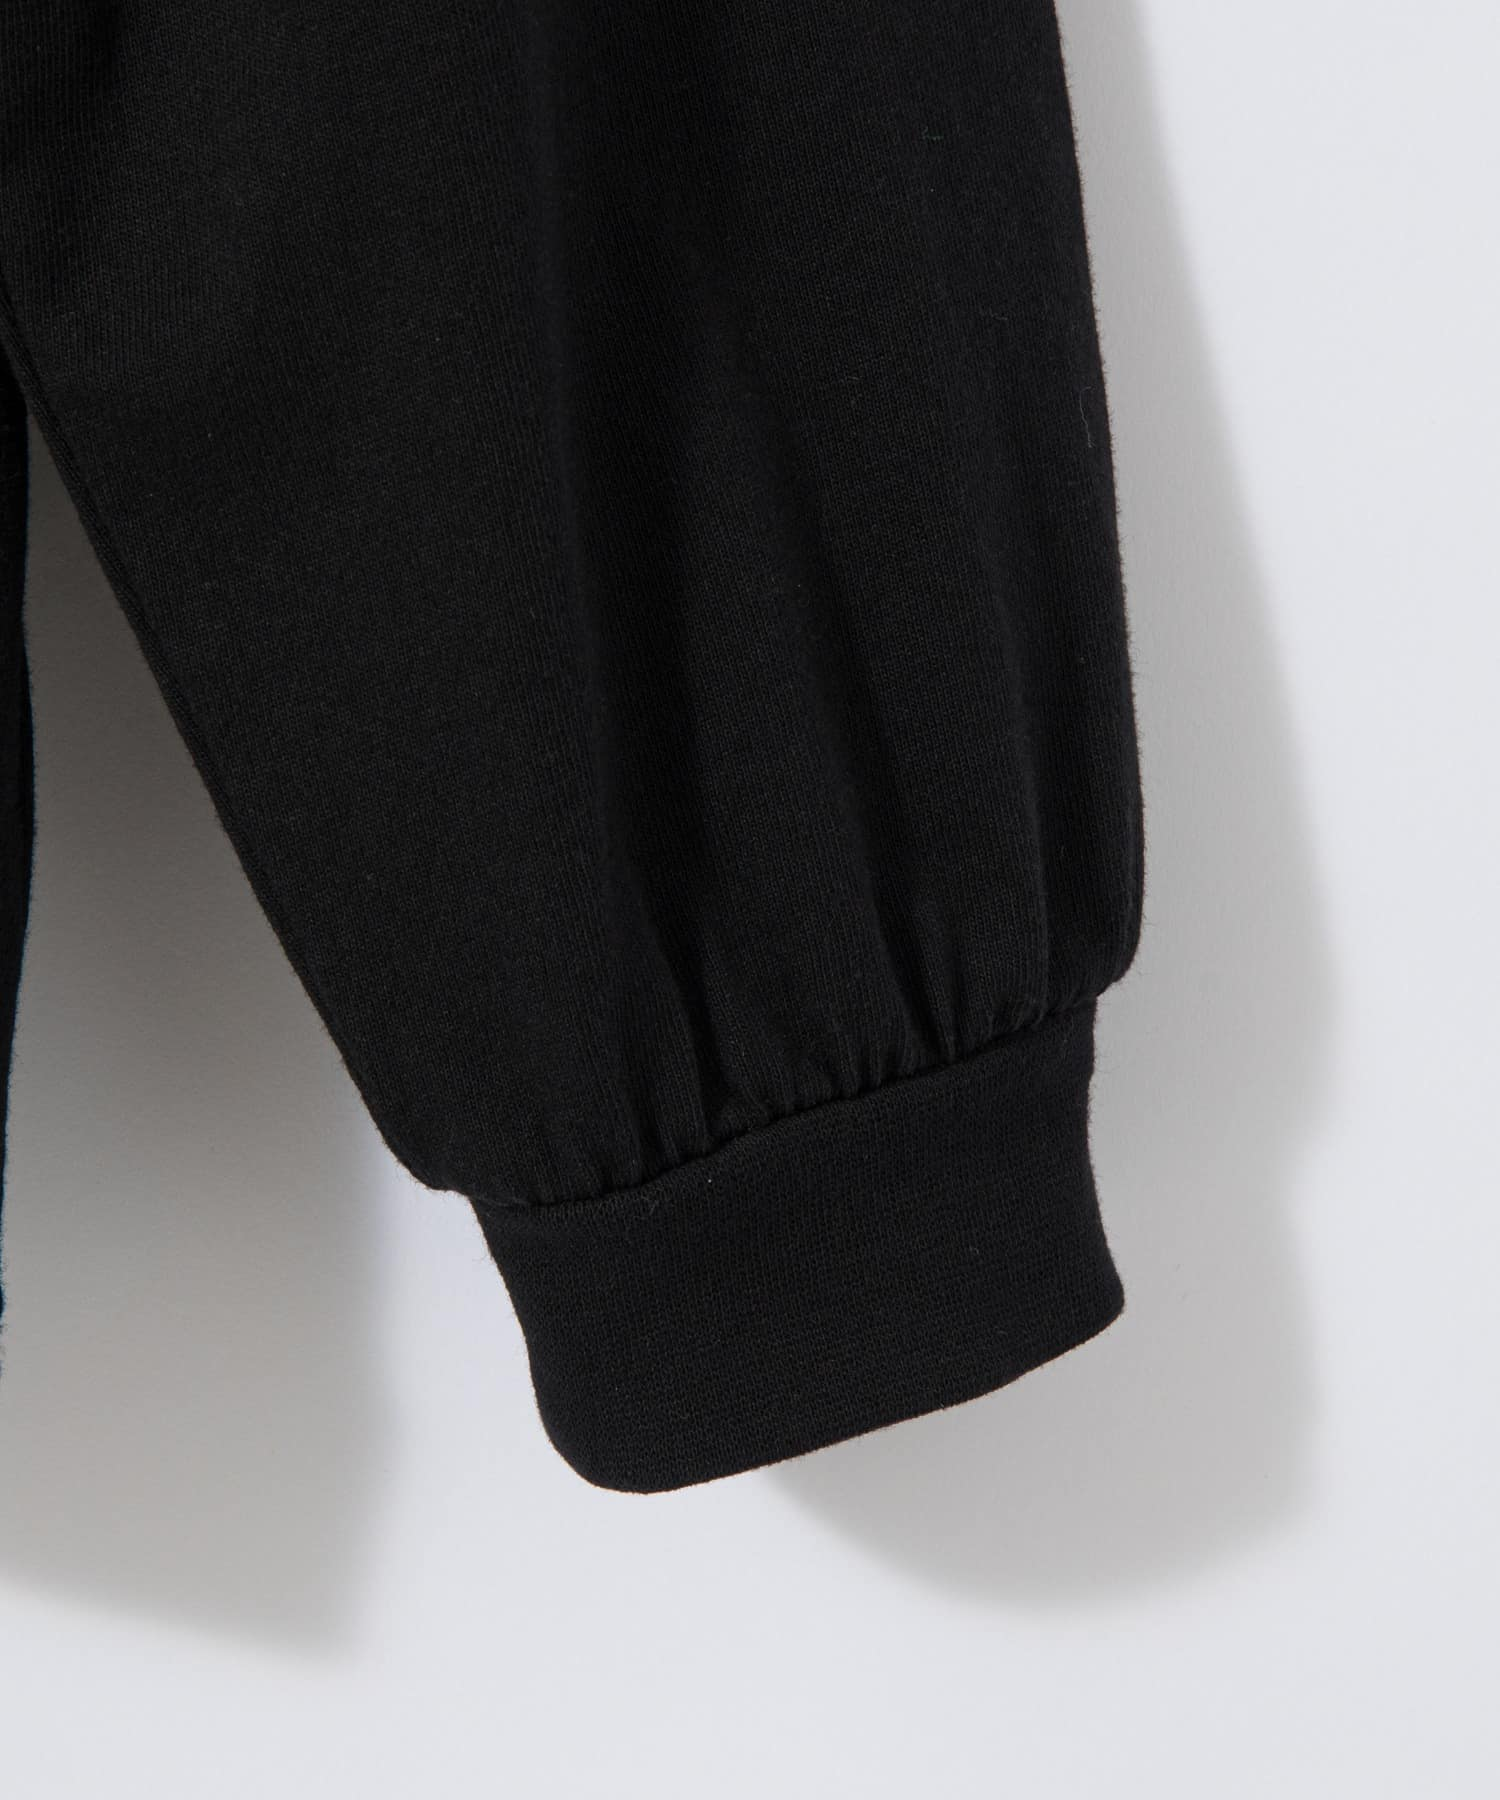 CIAOPANIC(チャオパニック) 【SUPERTHANKS/スーパーサンクス】モックネックロングスリーブTシャツ